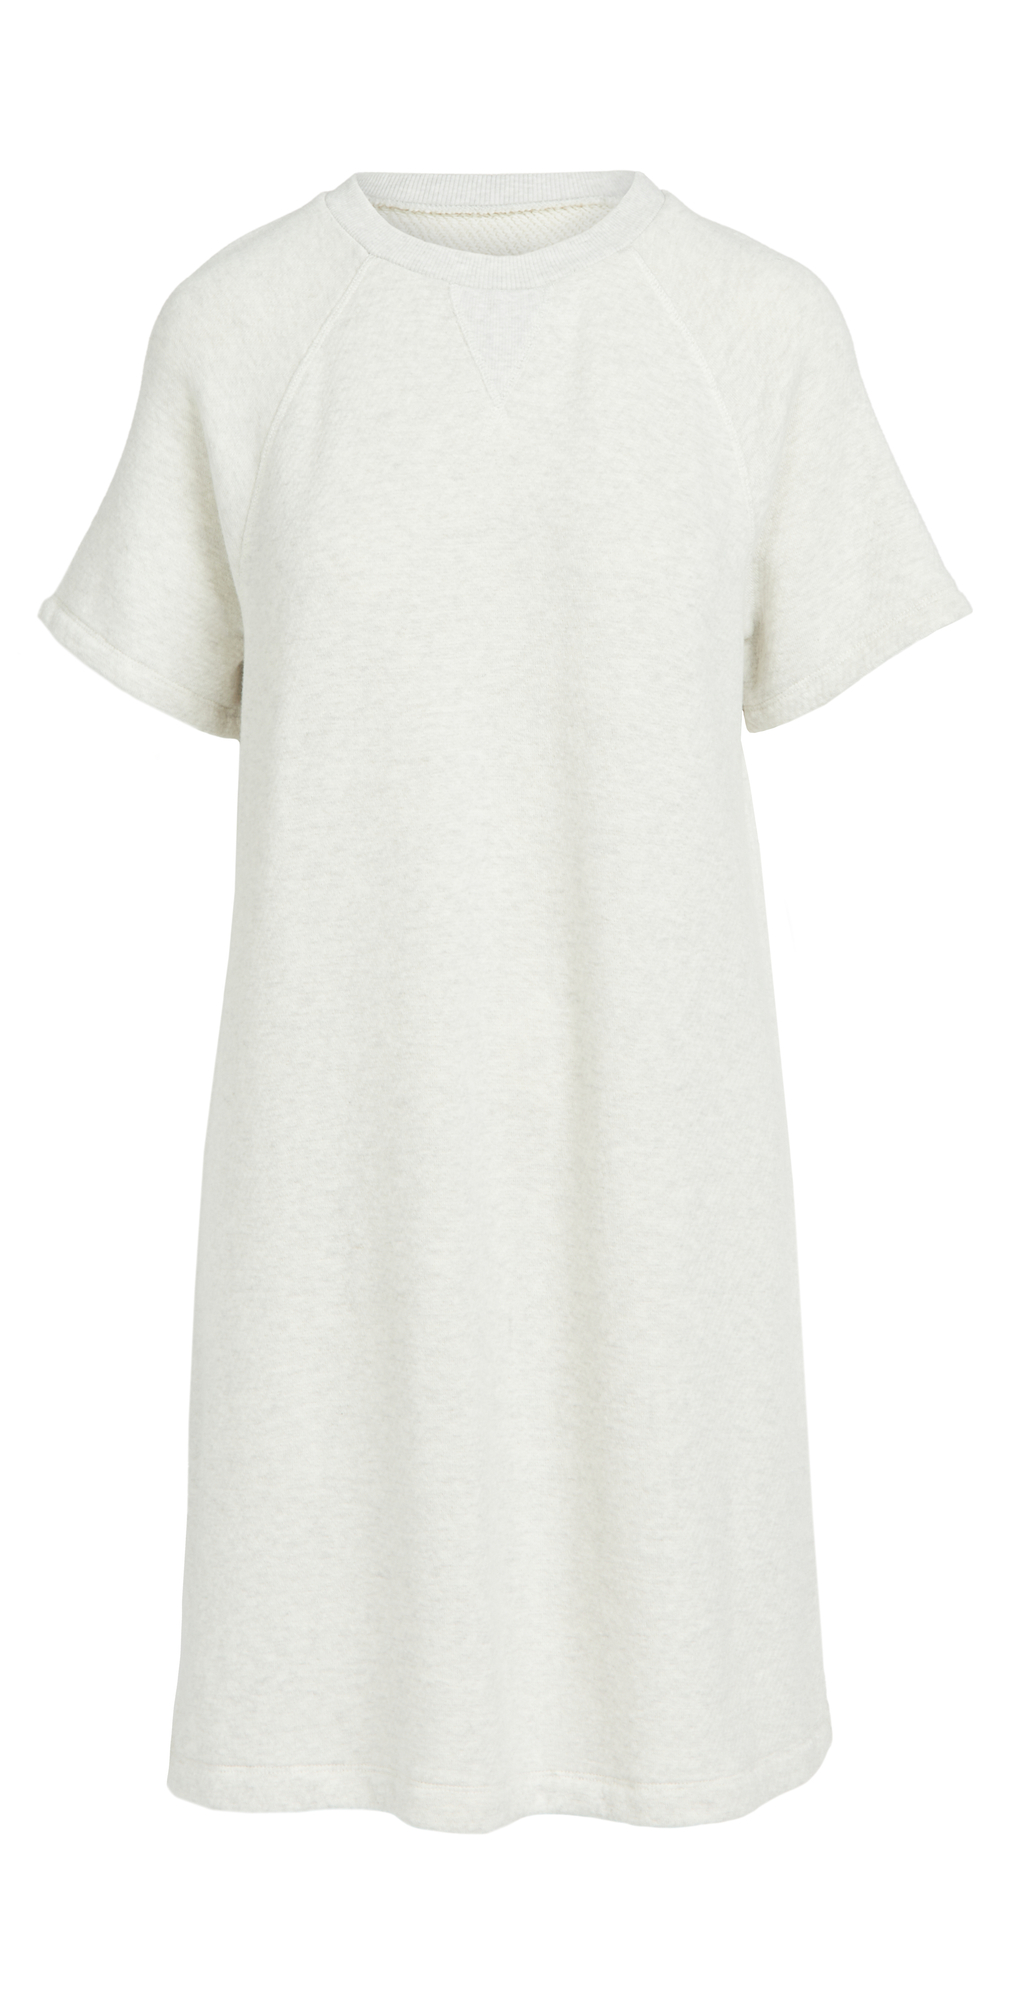 Airyterry Sweatshirt Tee Dress